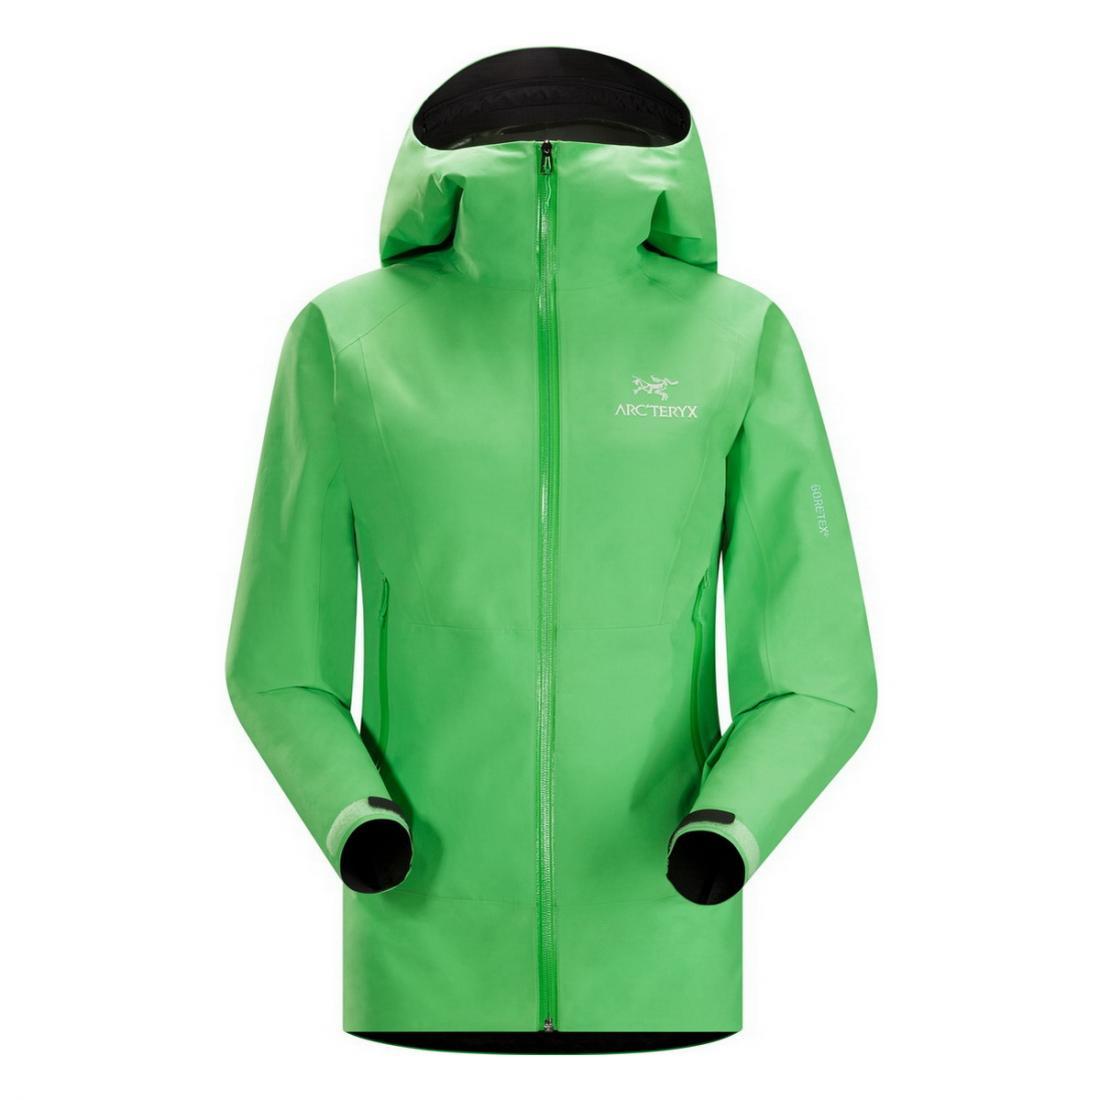 Куртка Beta SL жен.. Производитель: Arcteryx, артикул: 144546